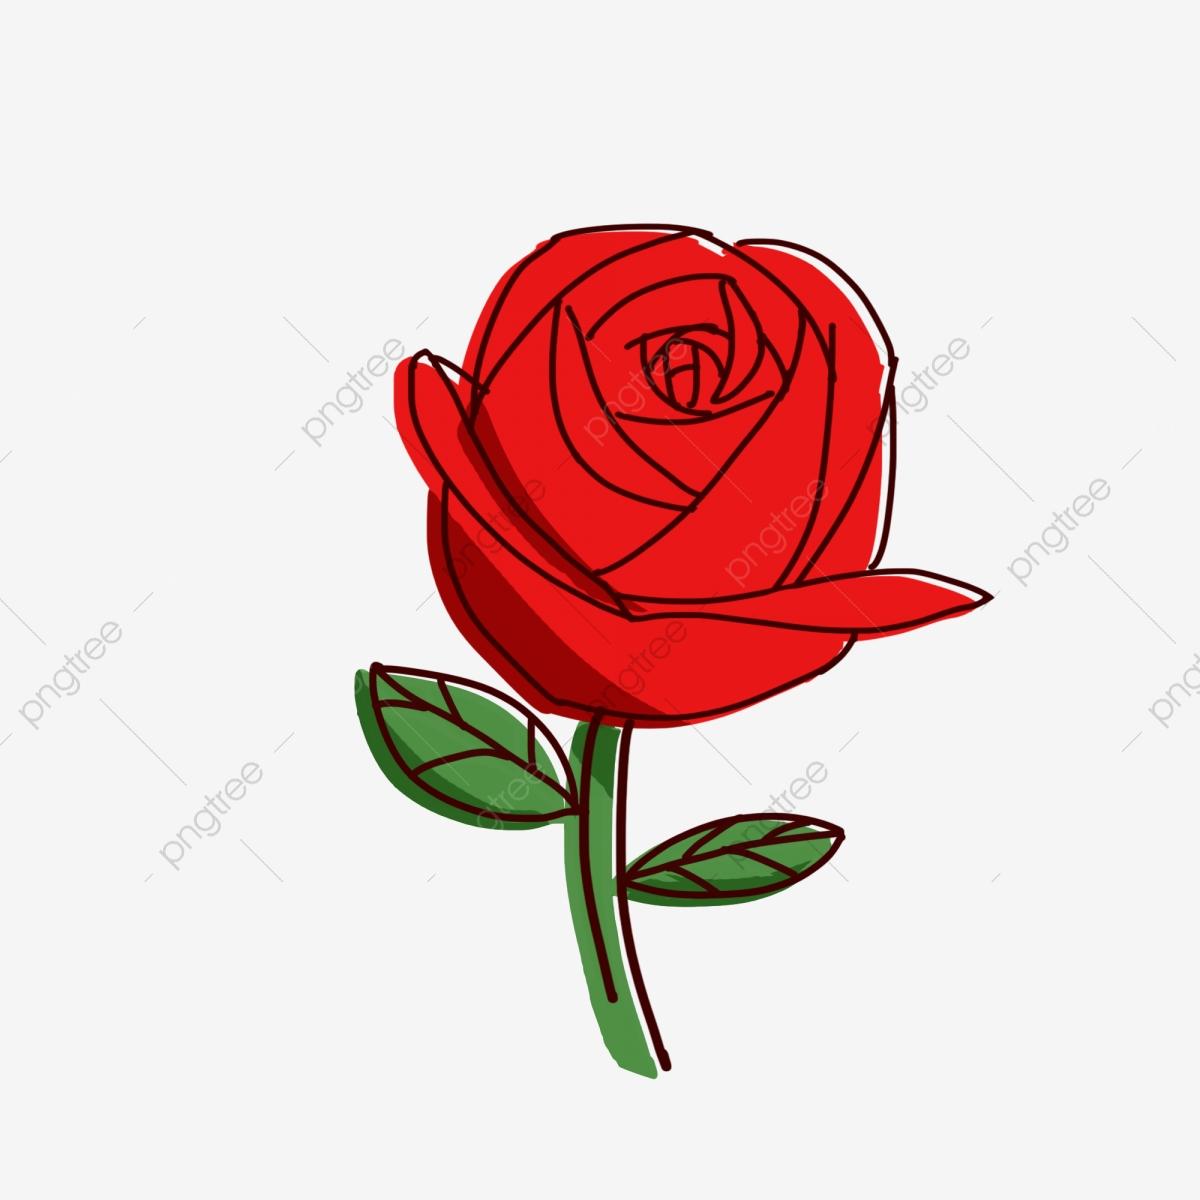 Clipart roses stick. Hand drawn cartoon figure